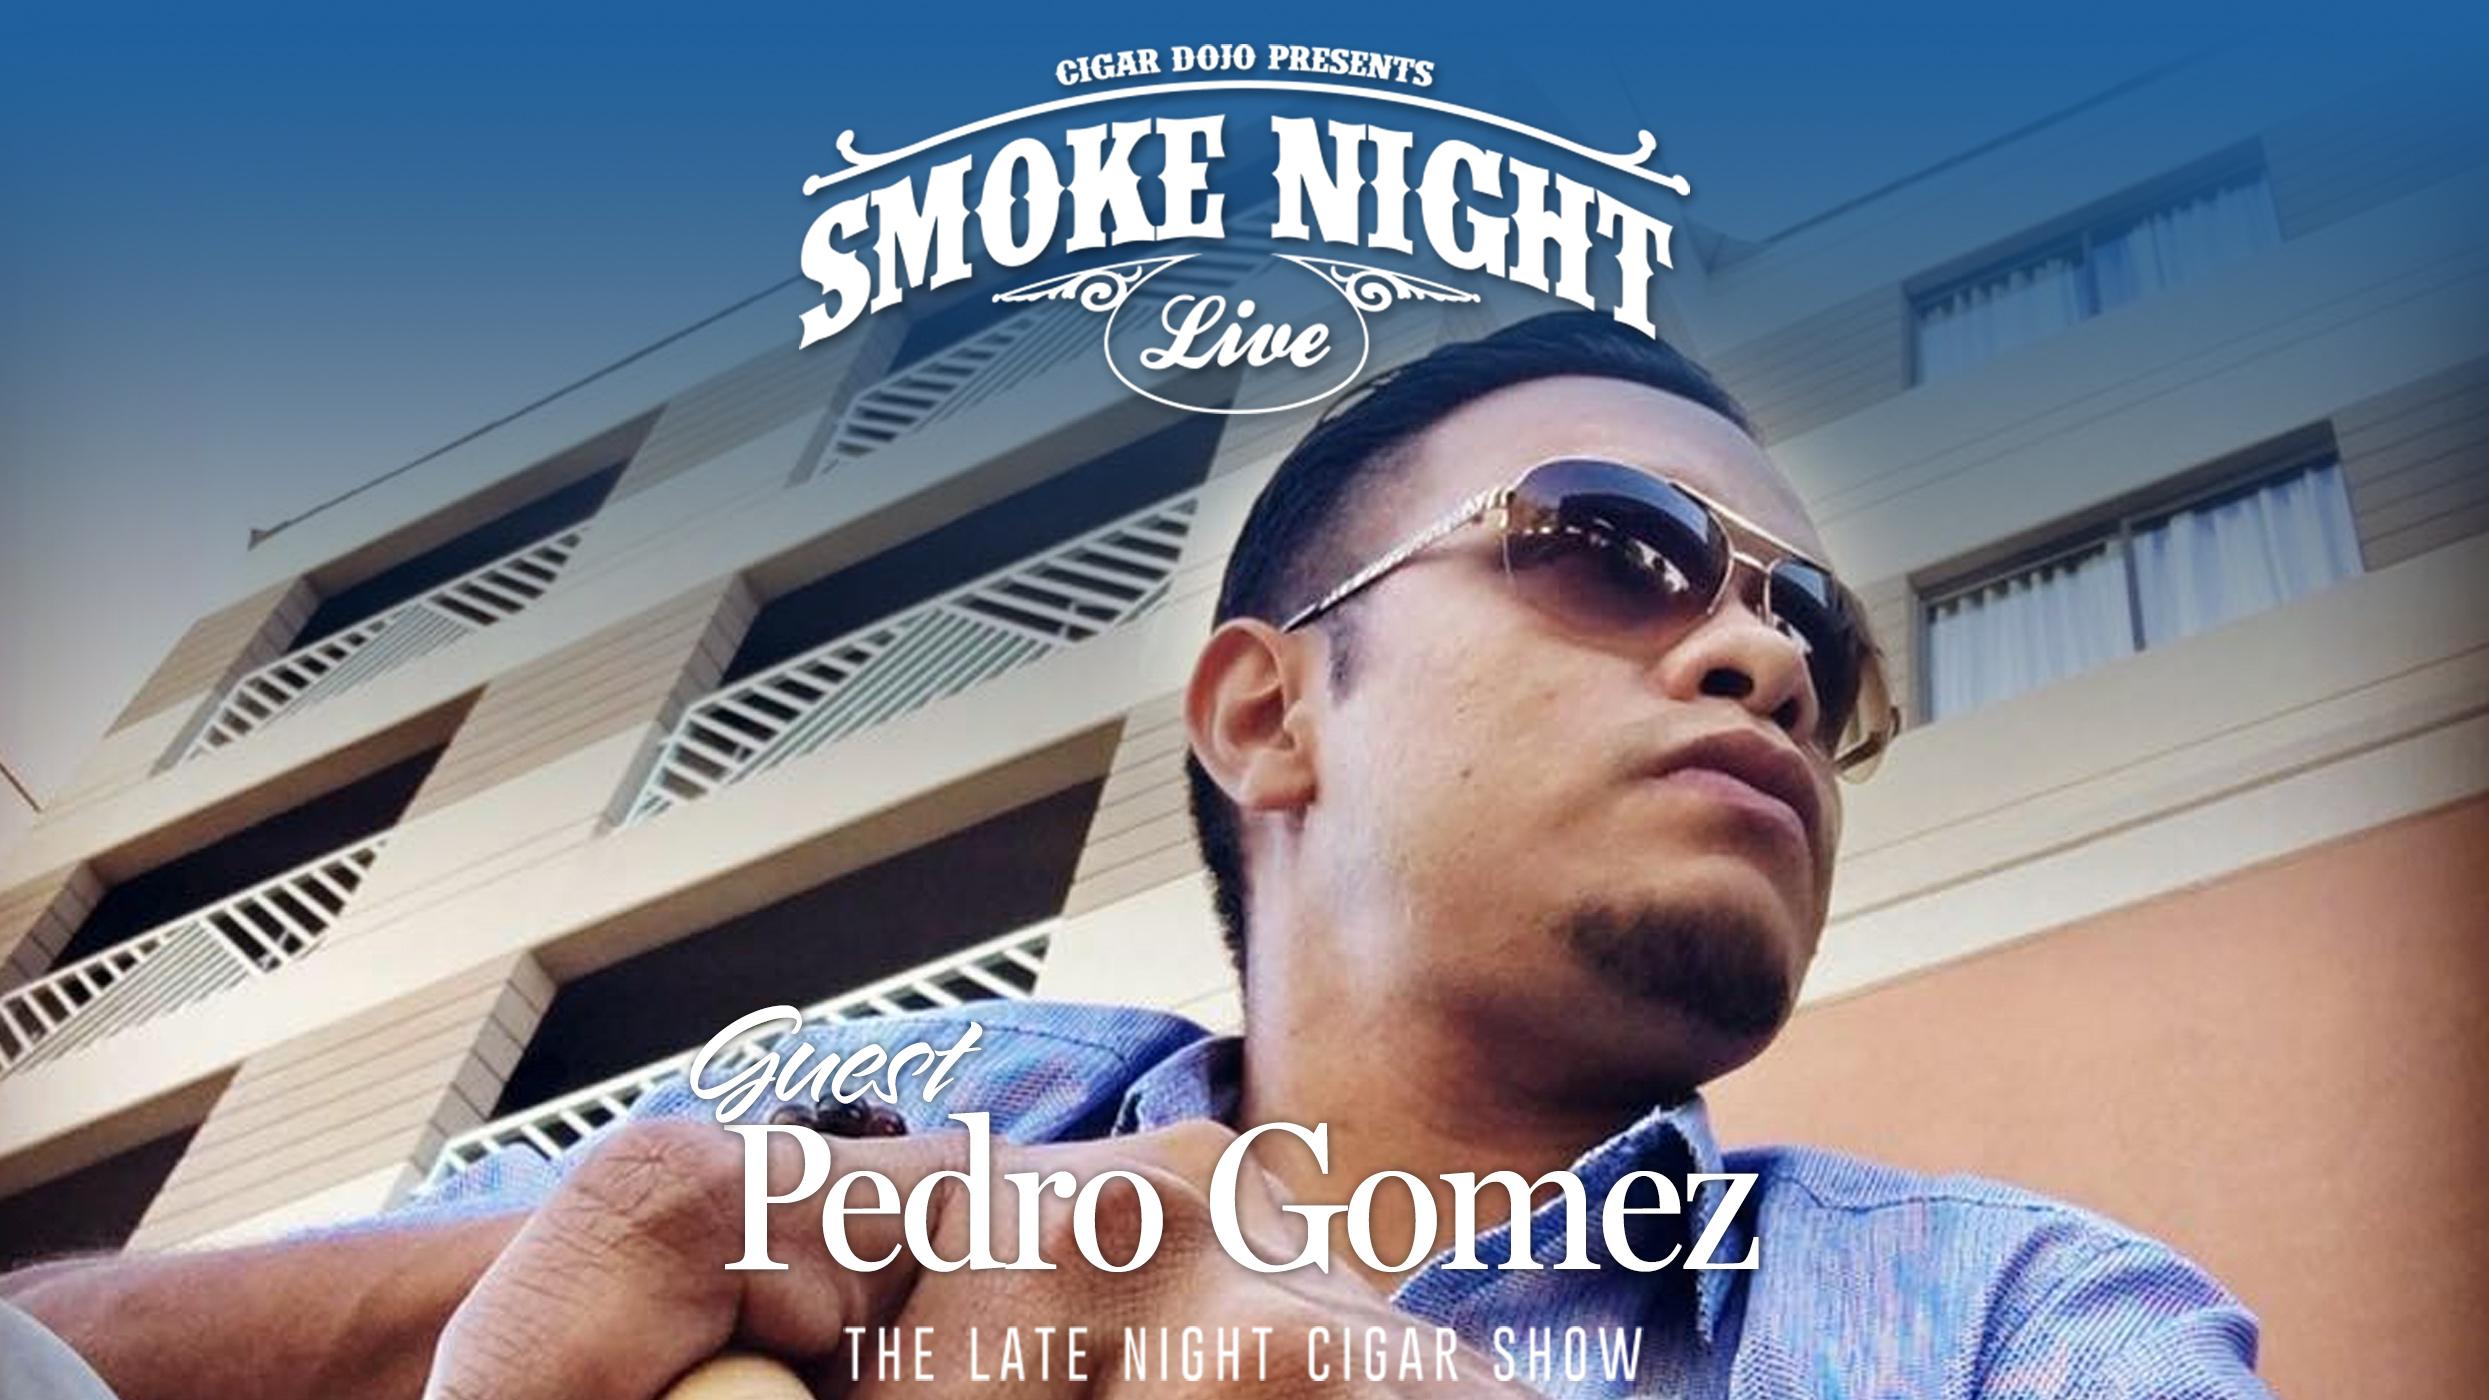 Drew Estate Factory Spokesman Pedro Gomez